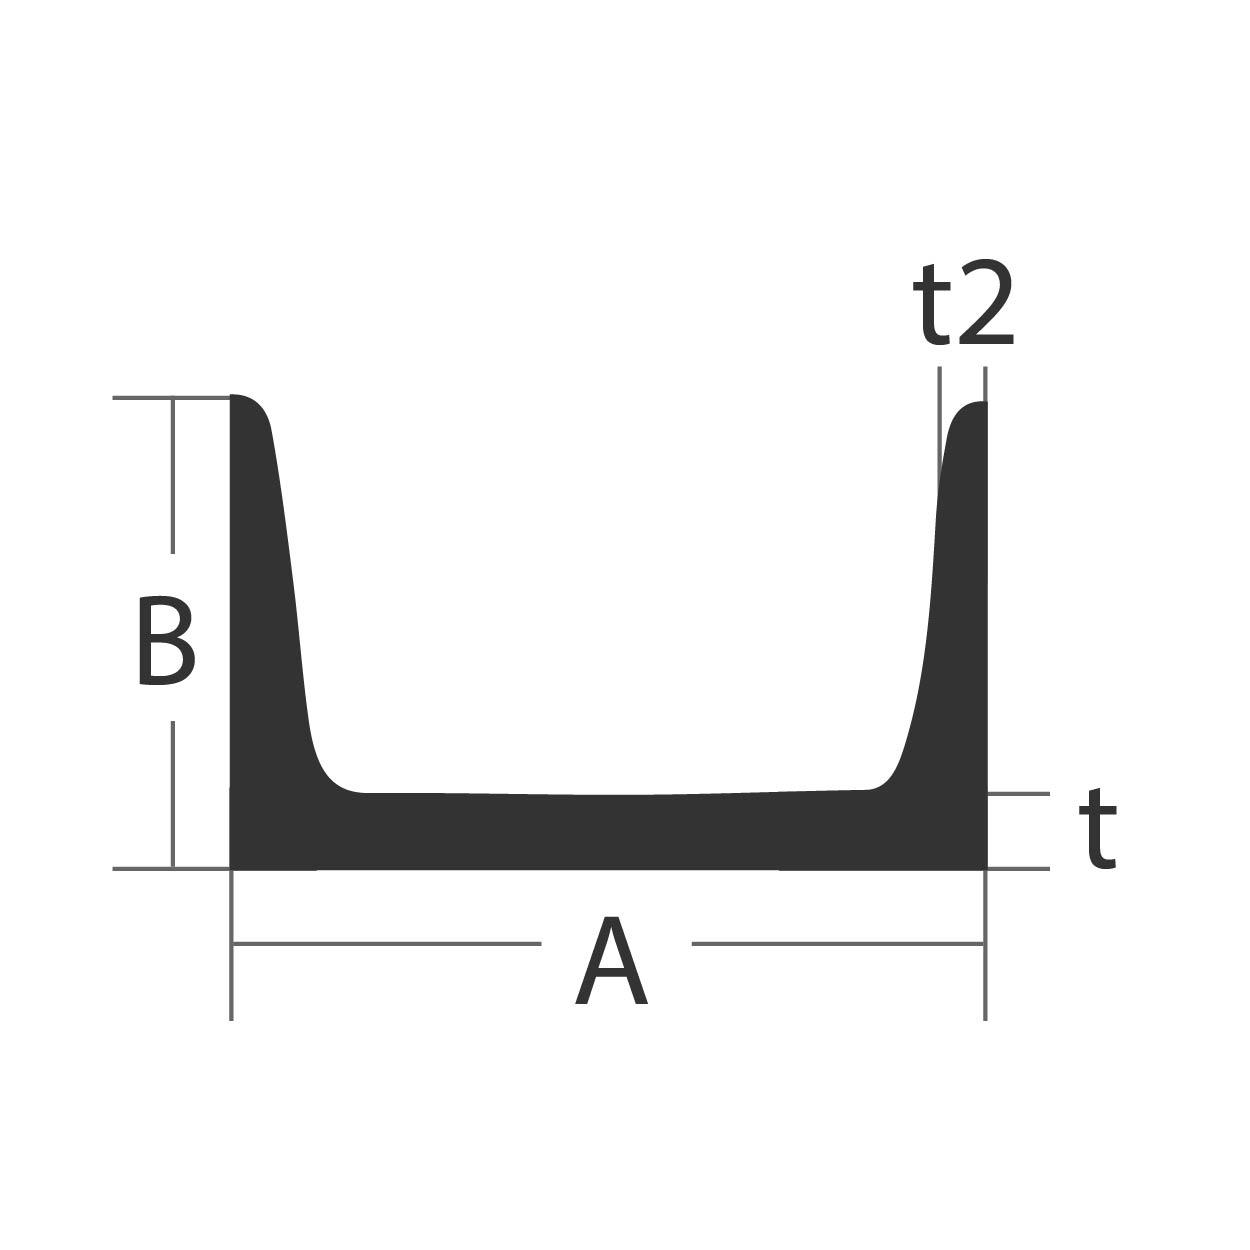 Aluminum Channel 6061 T6 Structural 15 A X 3 4 B X 0 4